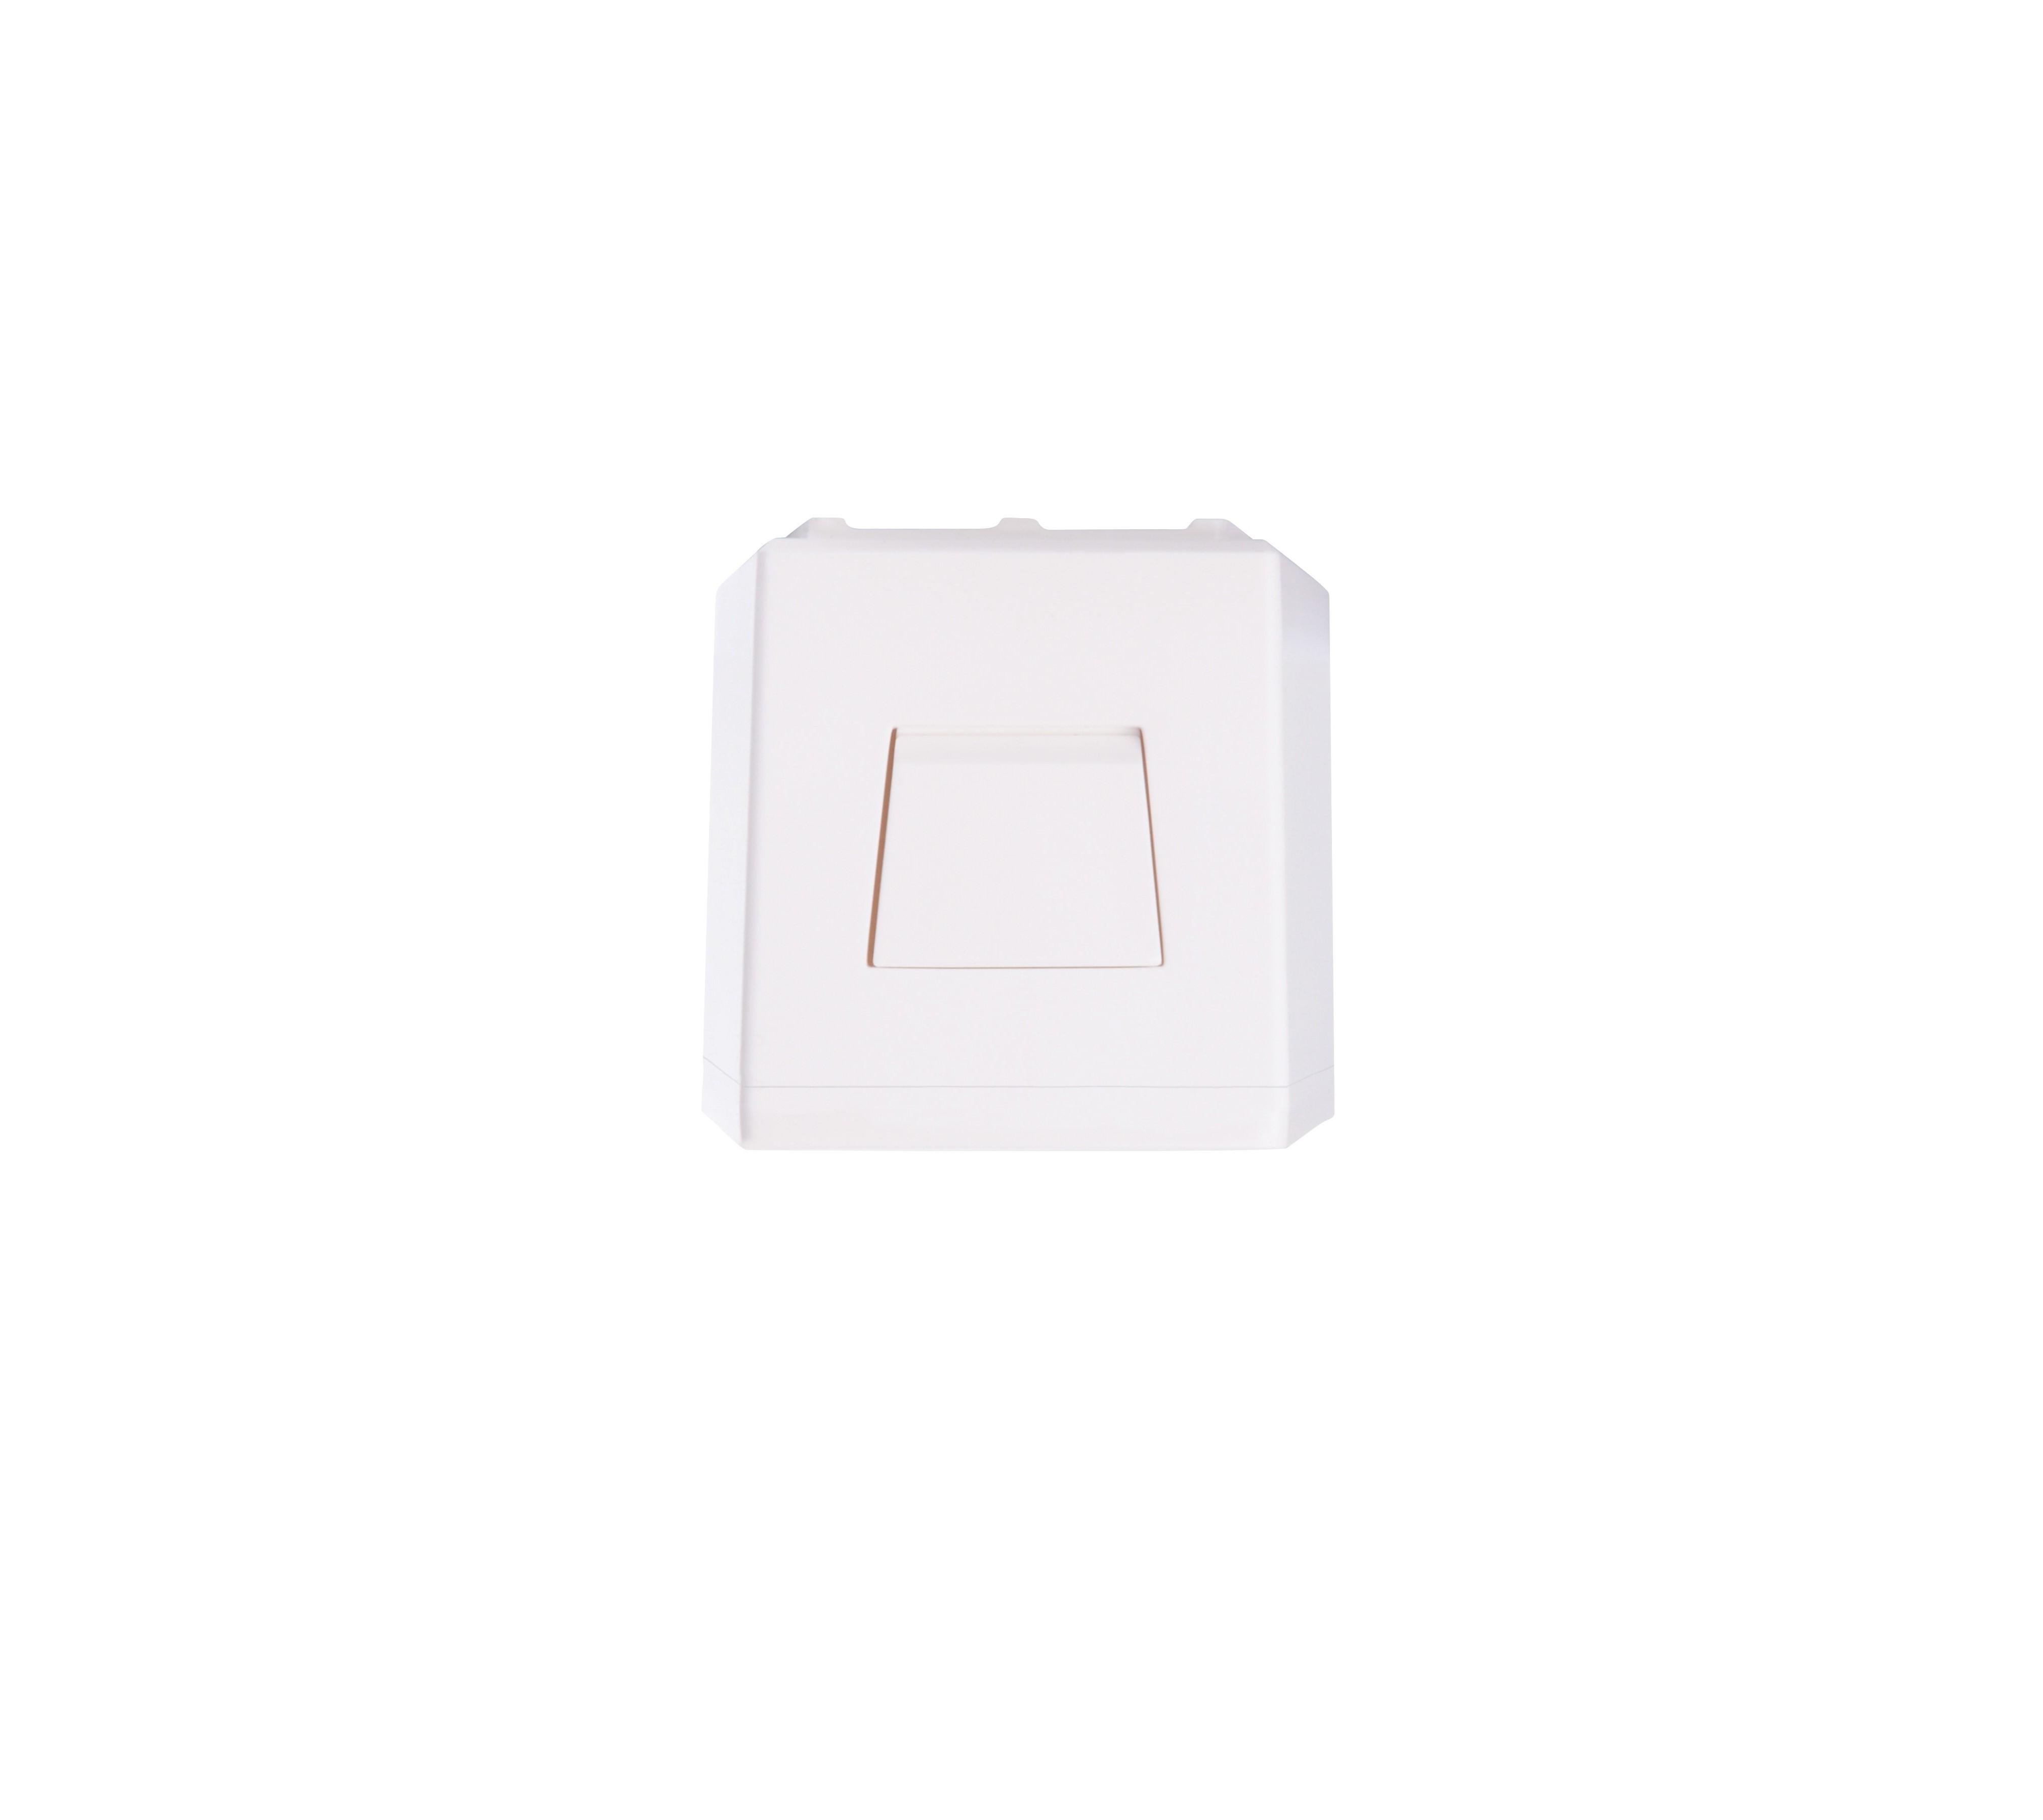 Lampa emergenta led Intelight 94573   3h nementinut test automat 1